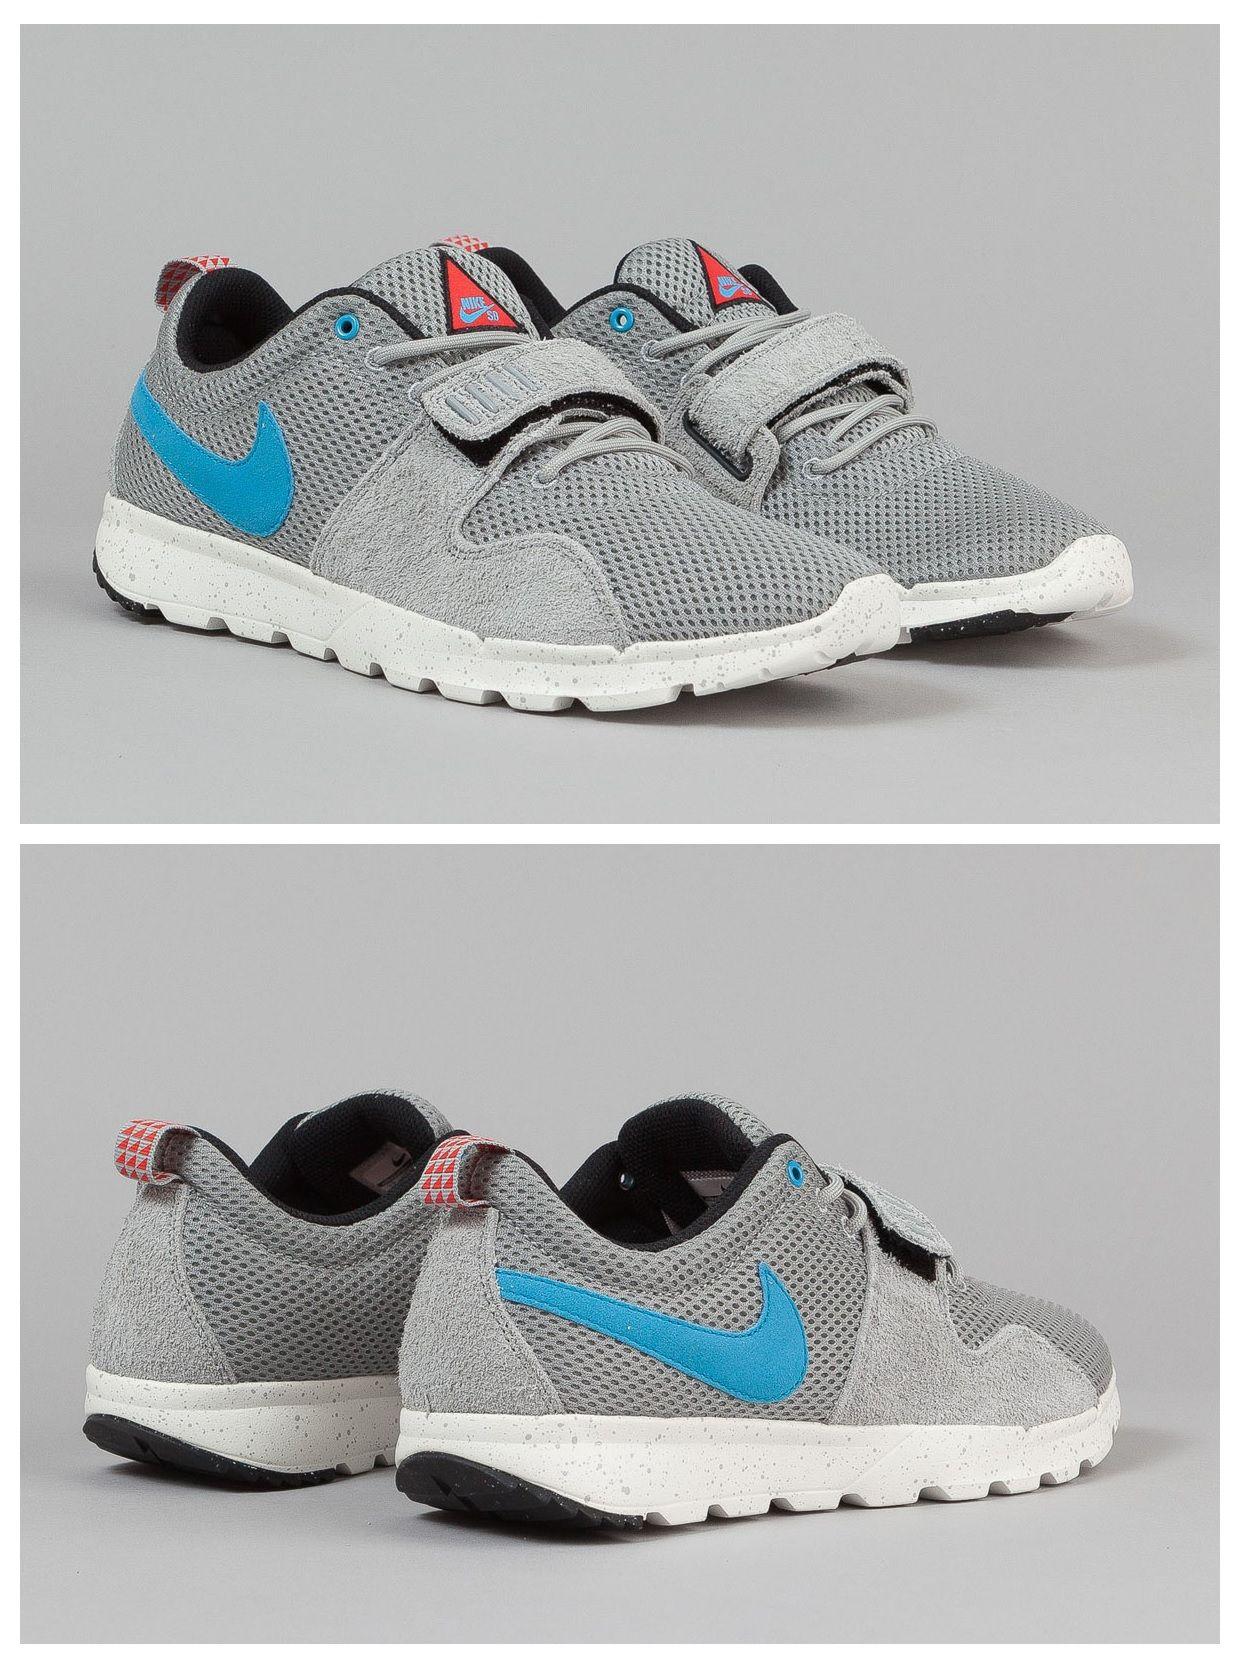 68f75f7f43c4 Nike SB Trainerendor: Grey/Blue | Best Shoes eva | Nike SB, Shoes, Nike